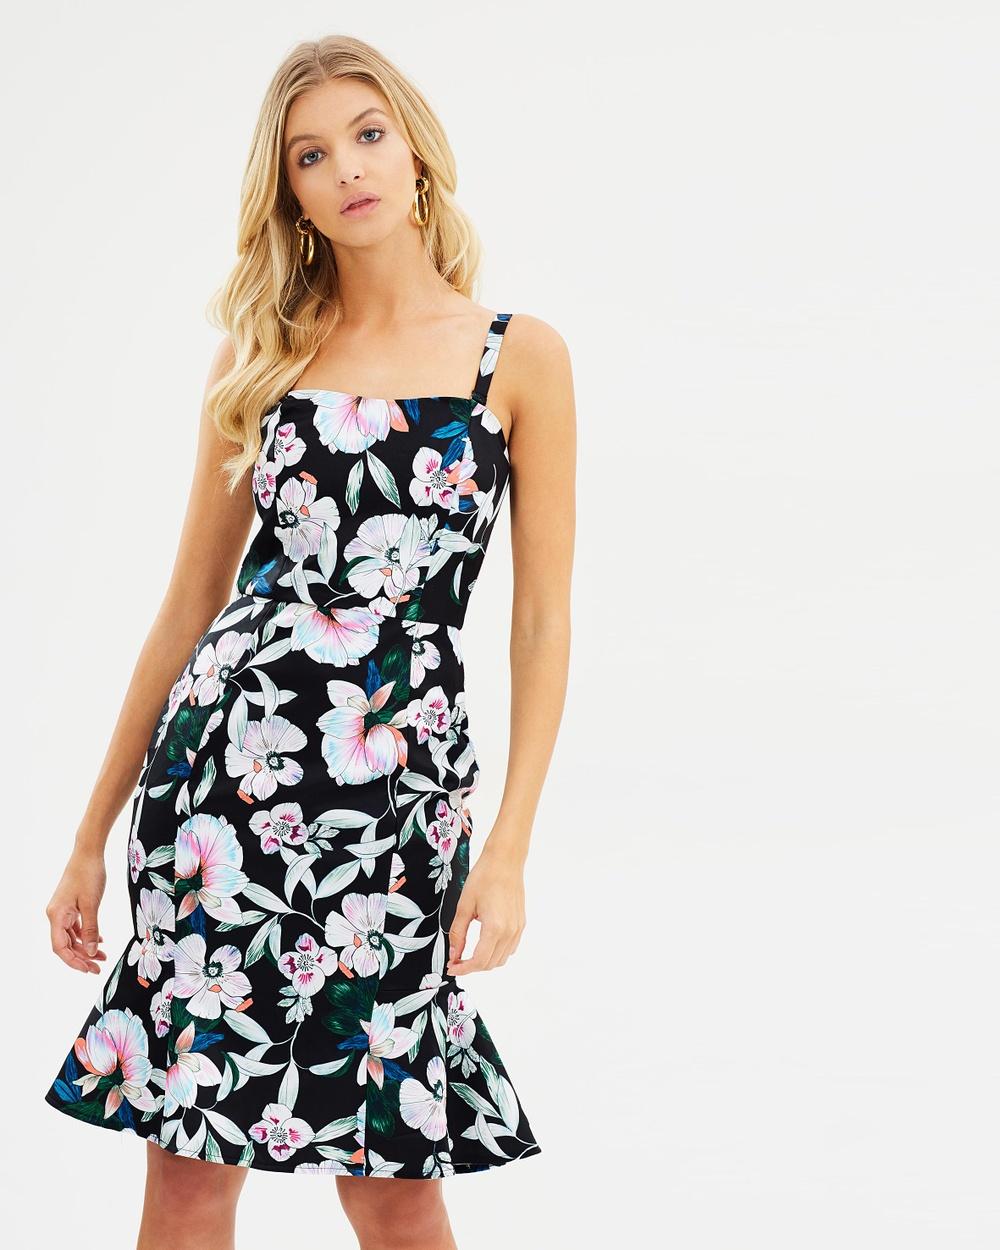 Cooper St Whimsical Blooms Strapless Midi Dress Printed Dresses Print Whimsical Blooms Strapless Midi Dress